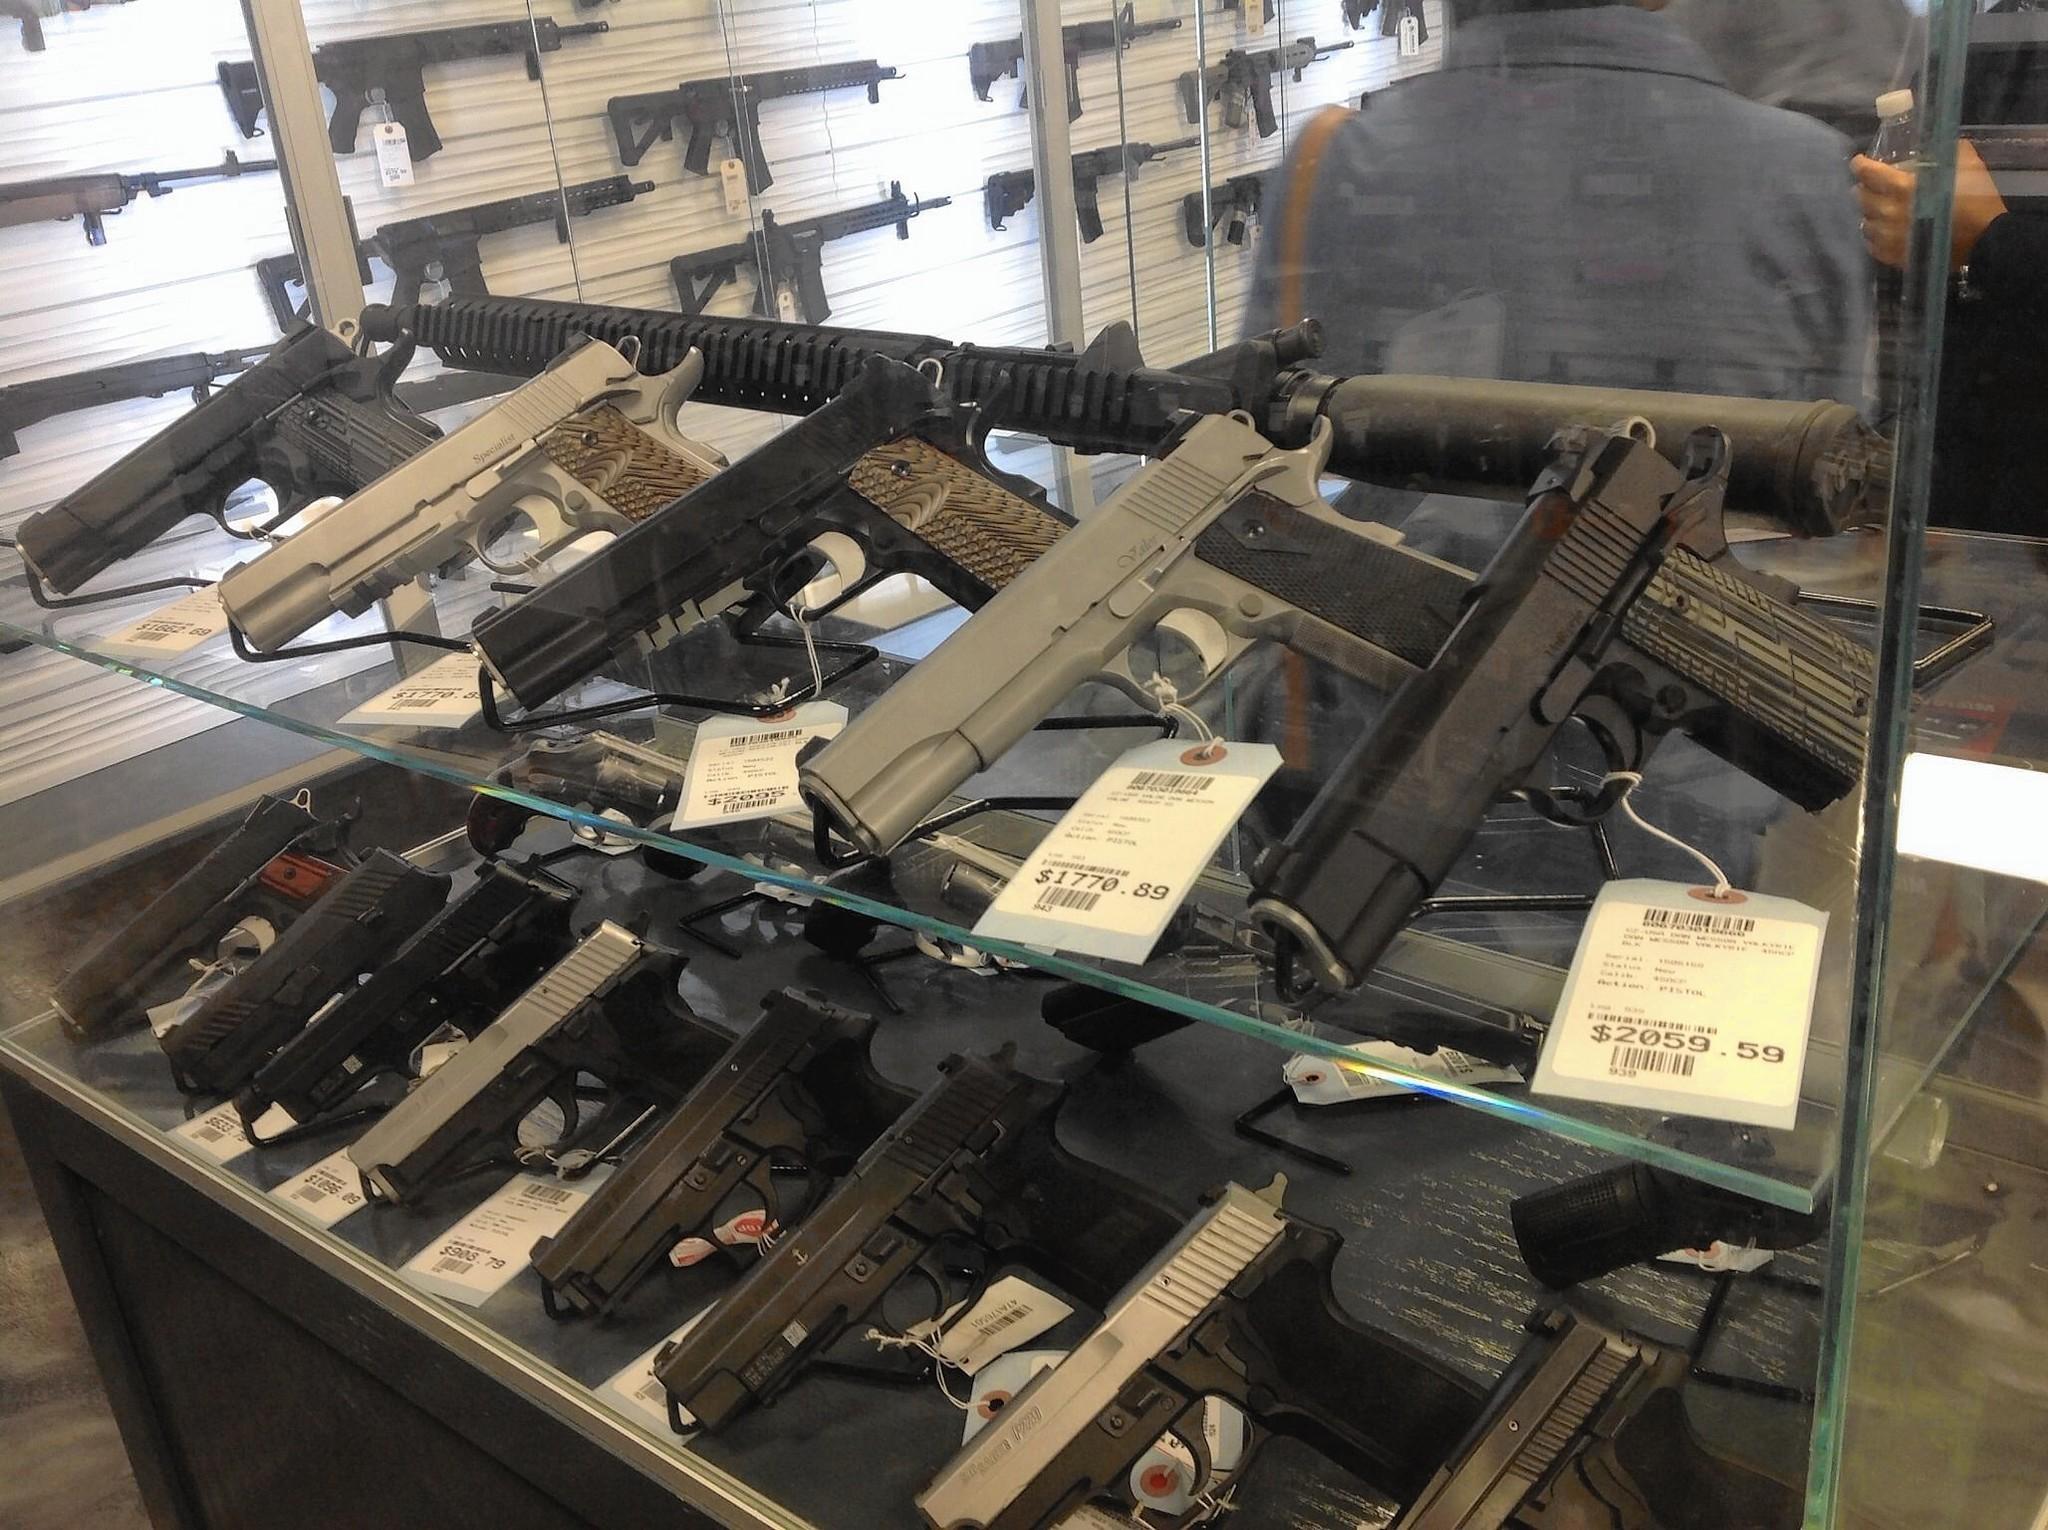 Indoor Pistol Rifle Range Opens In Oak Forest Daily